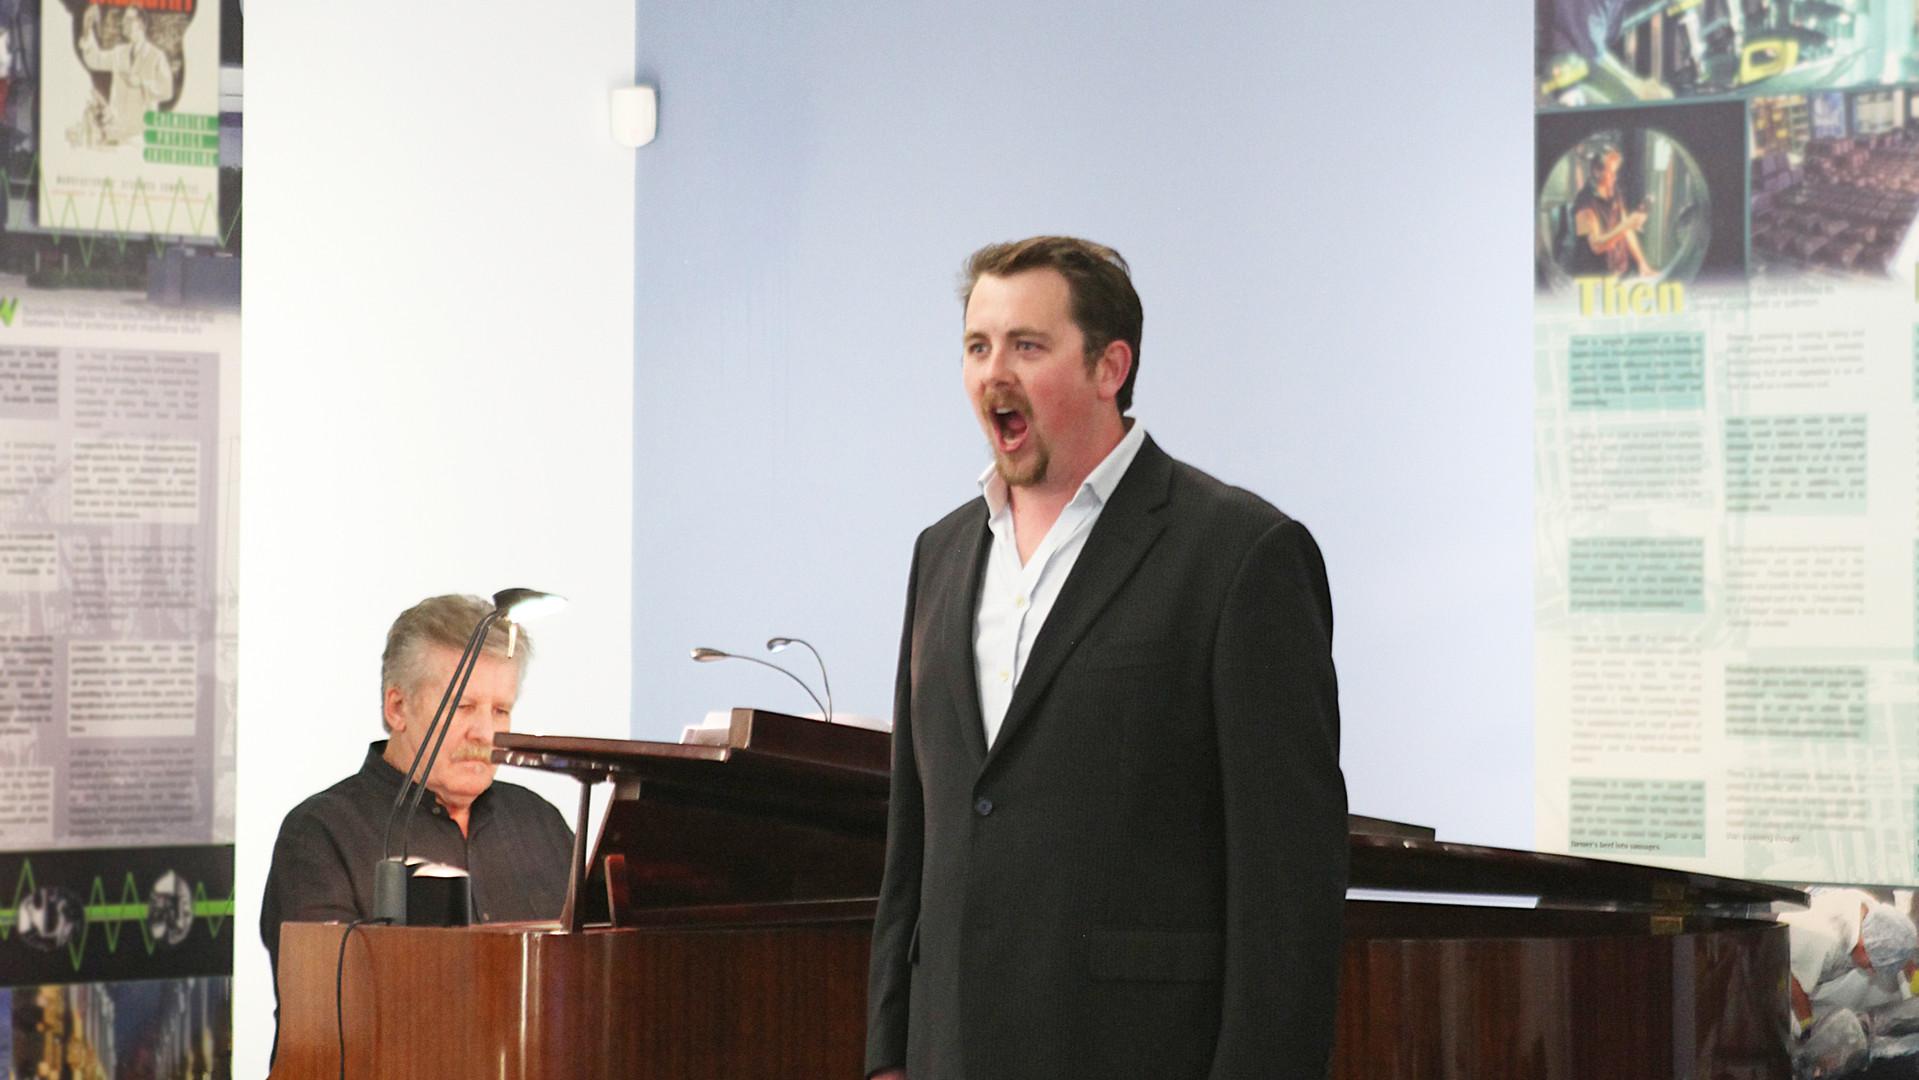 tutor robert tucker sings at school open